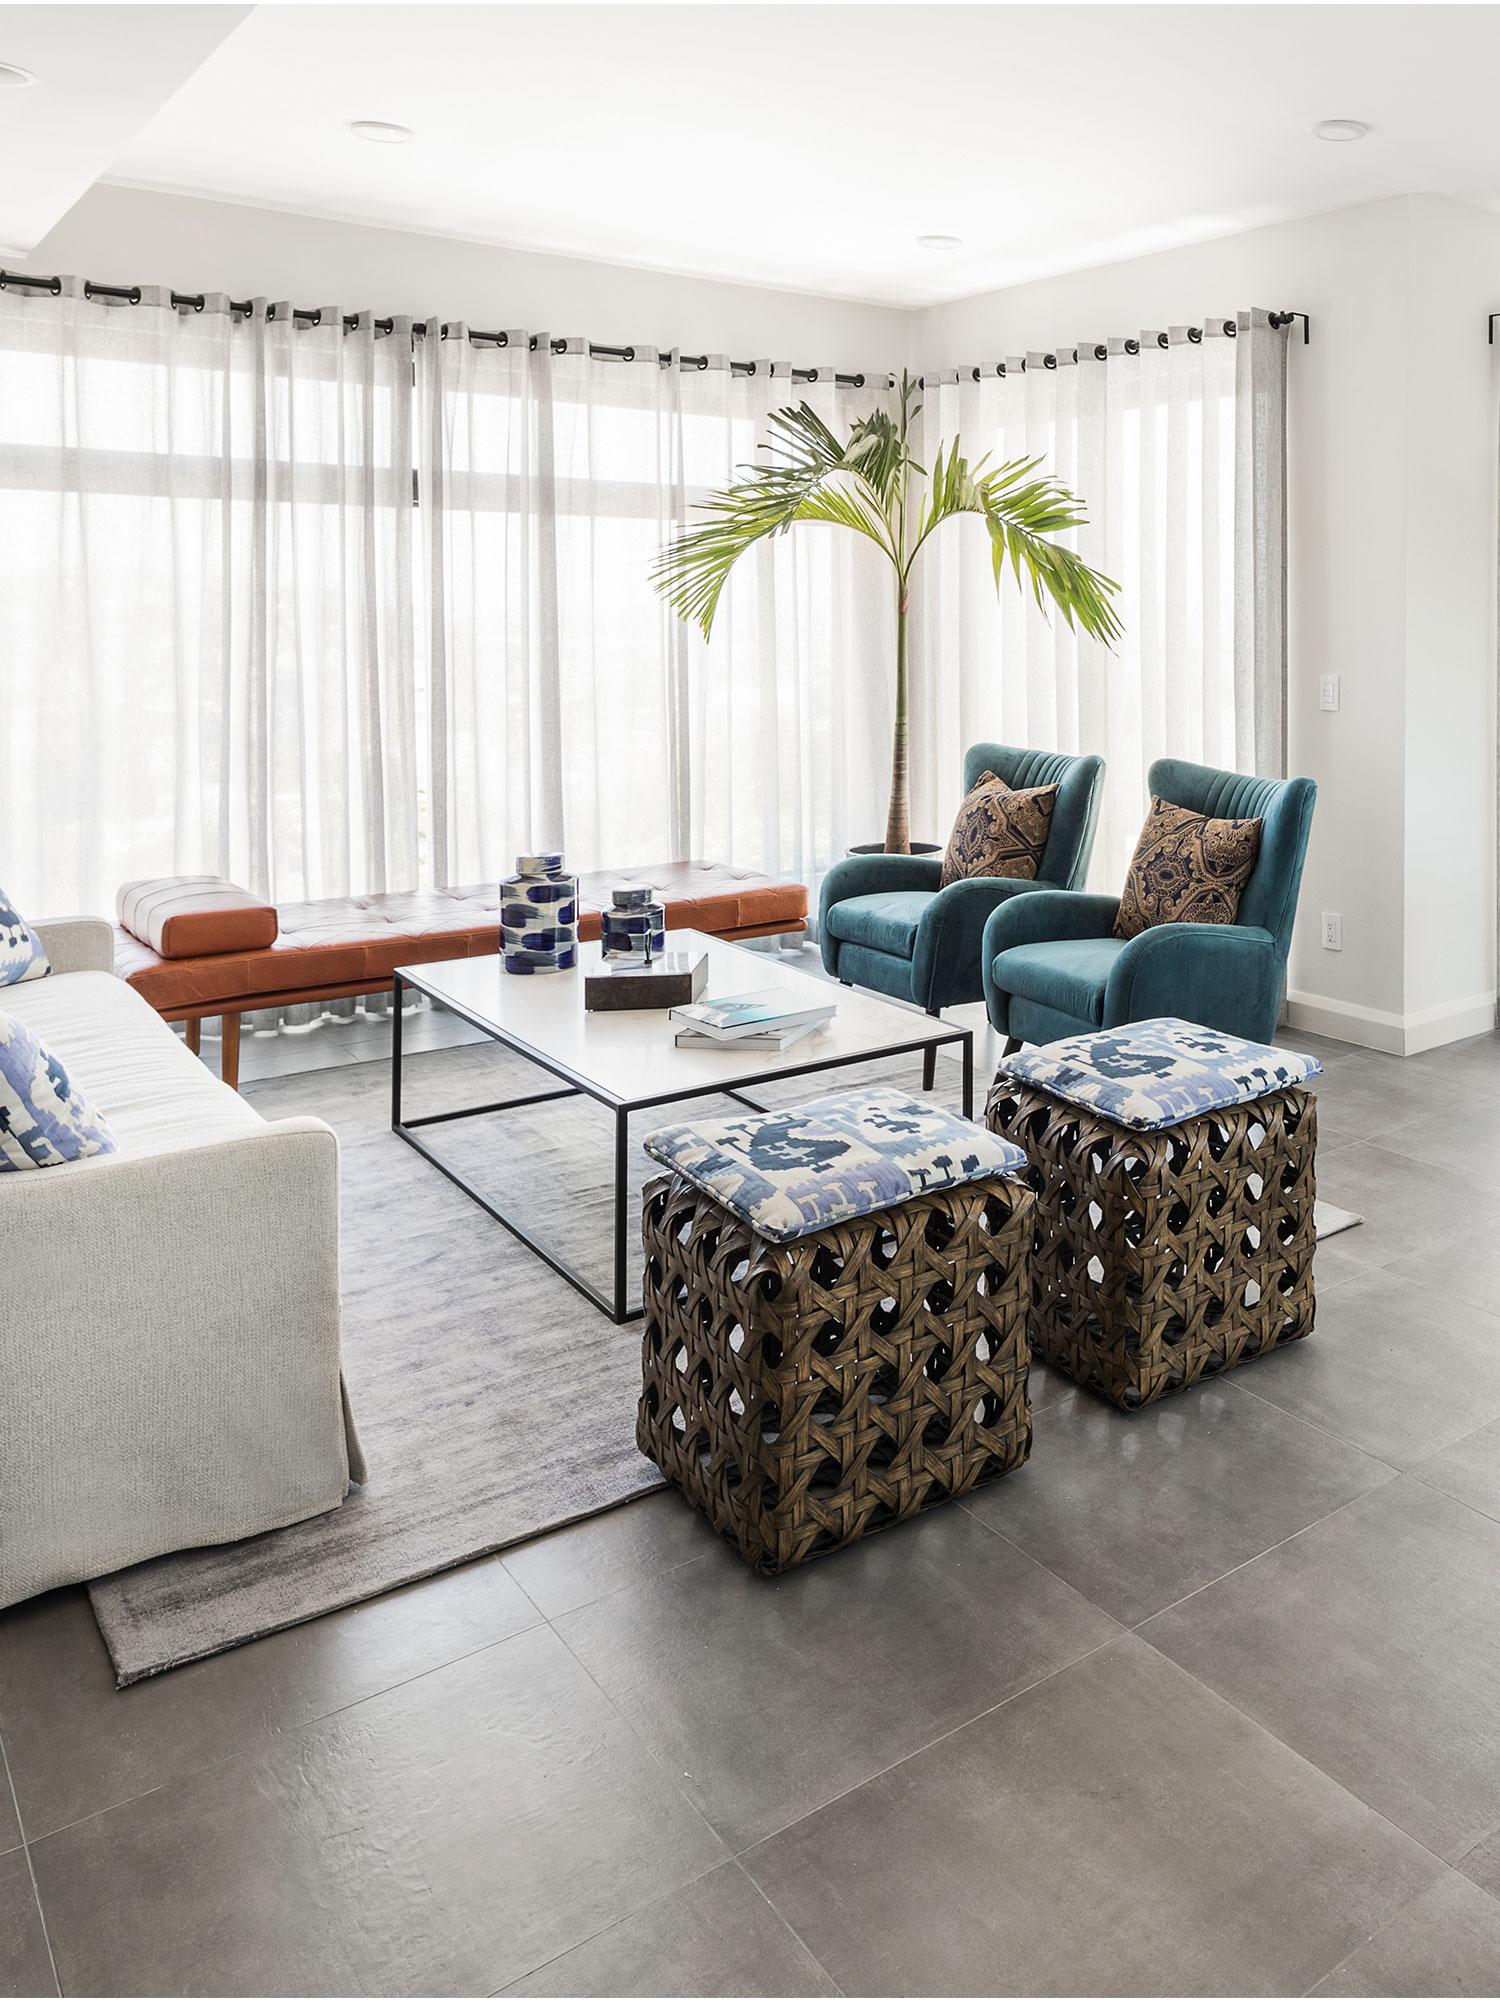 Ordaz-Coppel-Arquitectos-GR-H-Apartment.jpg